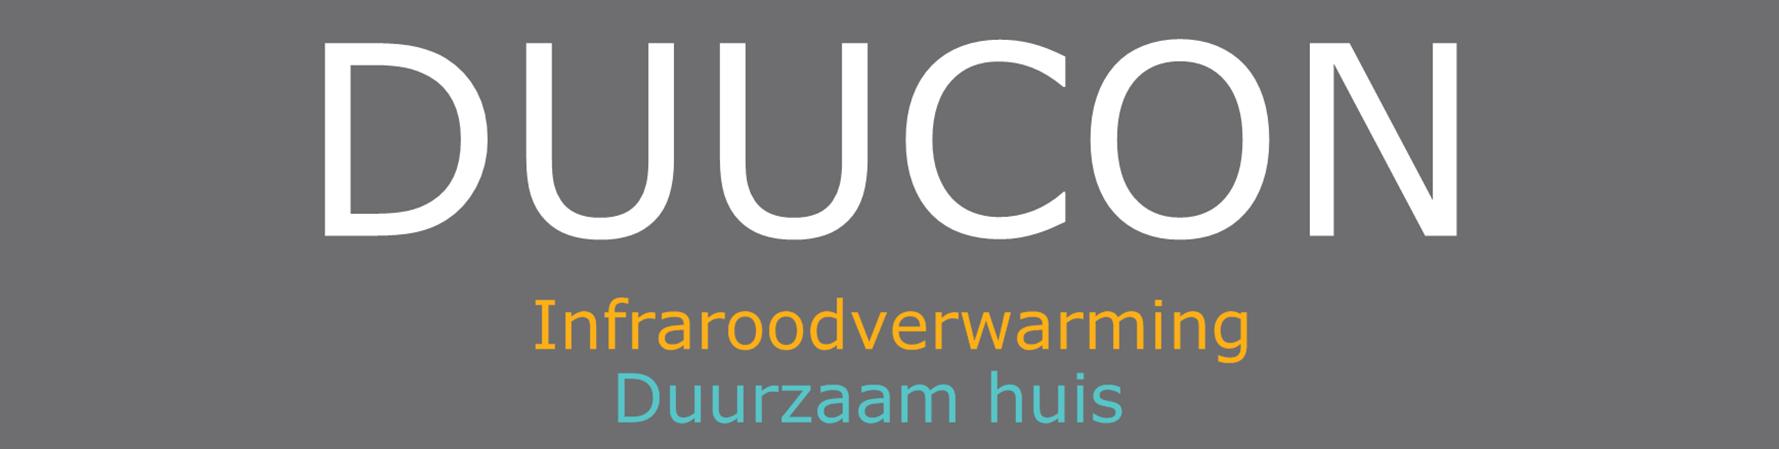 Duucon Infrarood verwarming